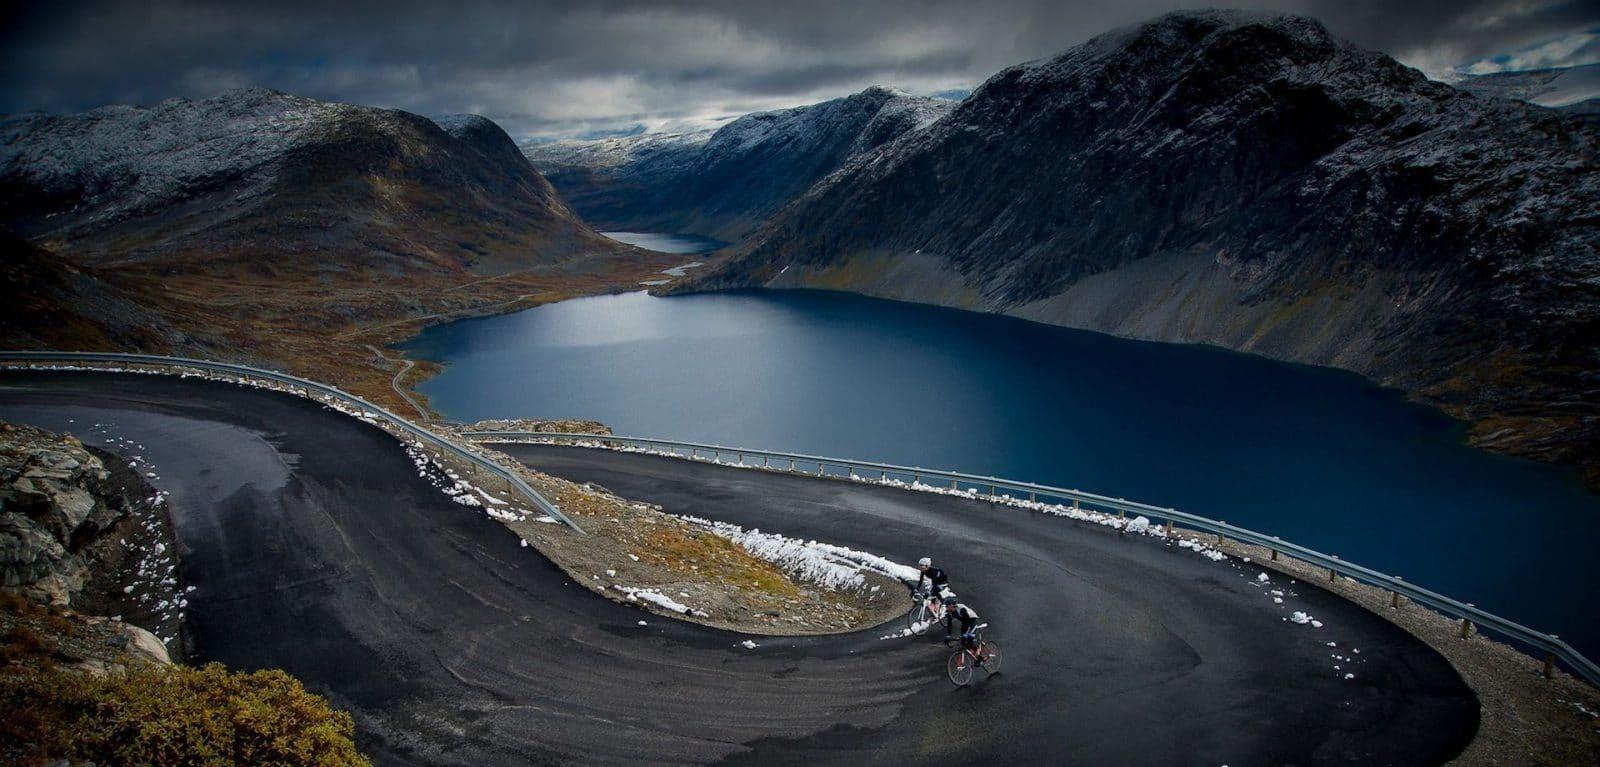 daliniu kroviniu gabenimas i norvegija